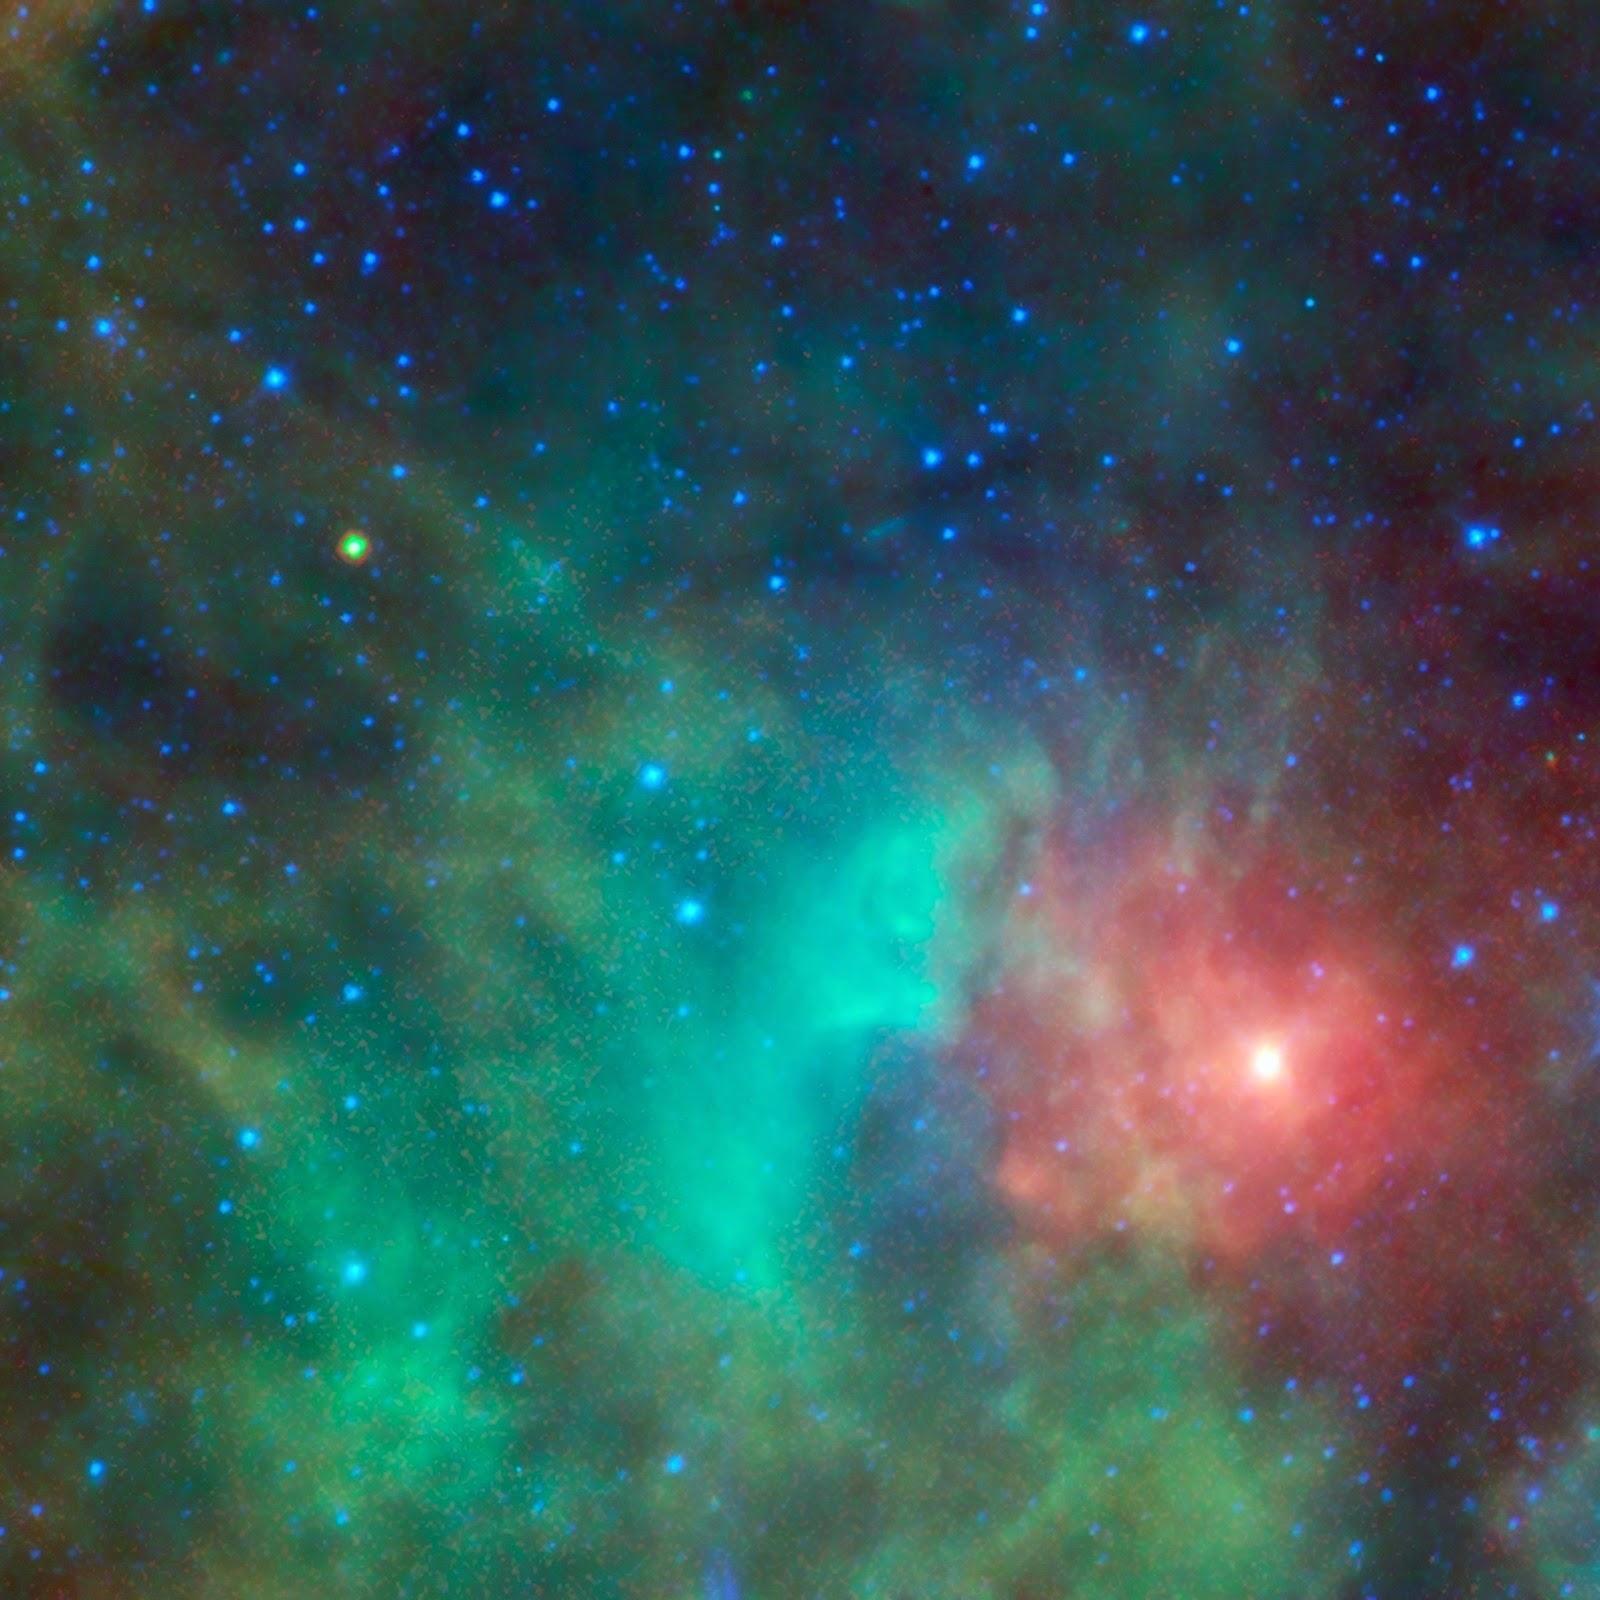 Sistema Solar - Parte 2: O Sol